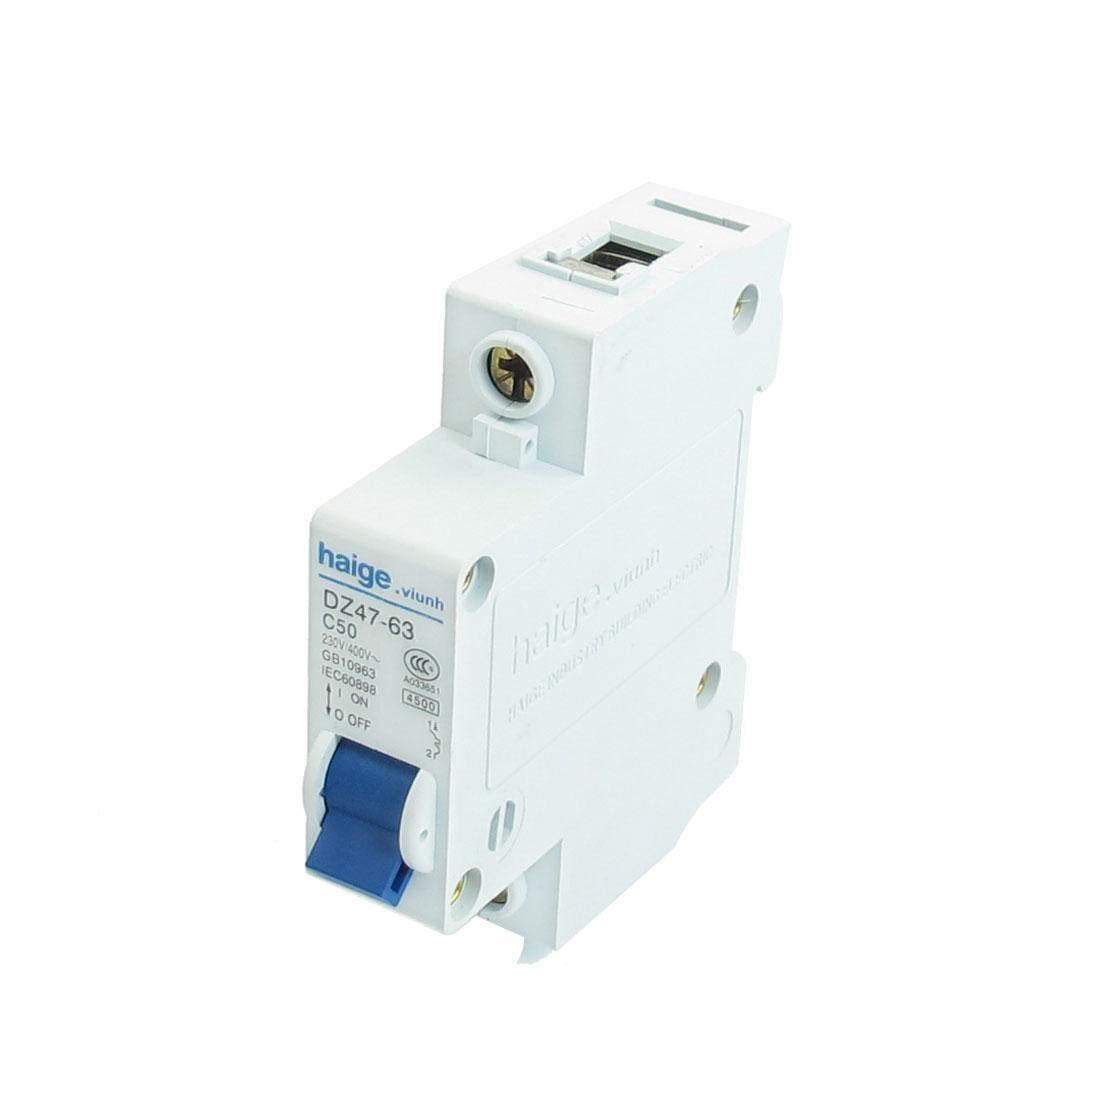 AC 230V 400V 50A 1 Pole MCB Miniature Circuit Breaker DZ47-63 C50